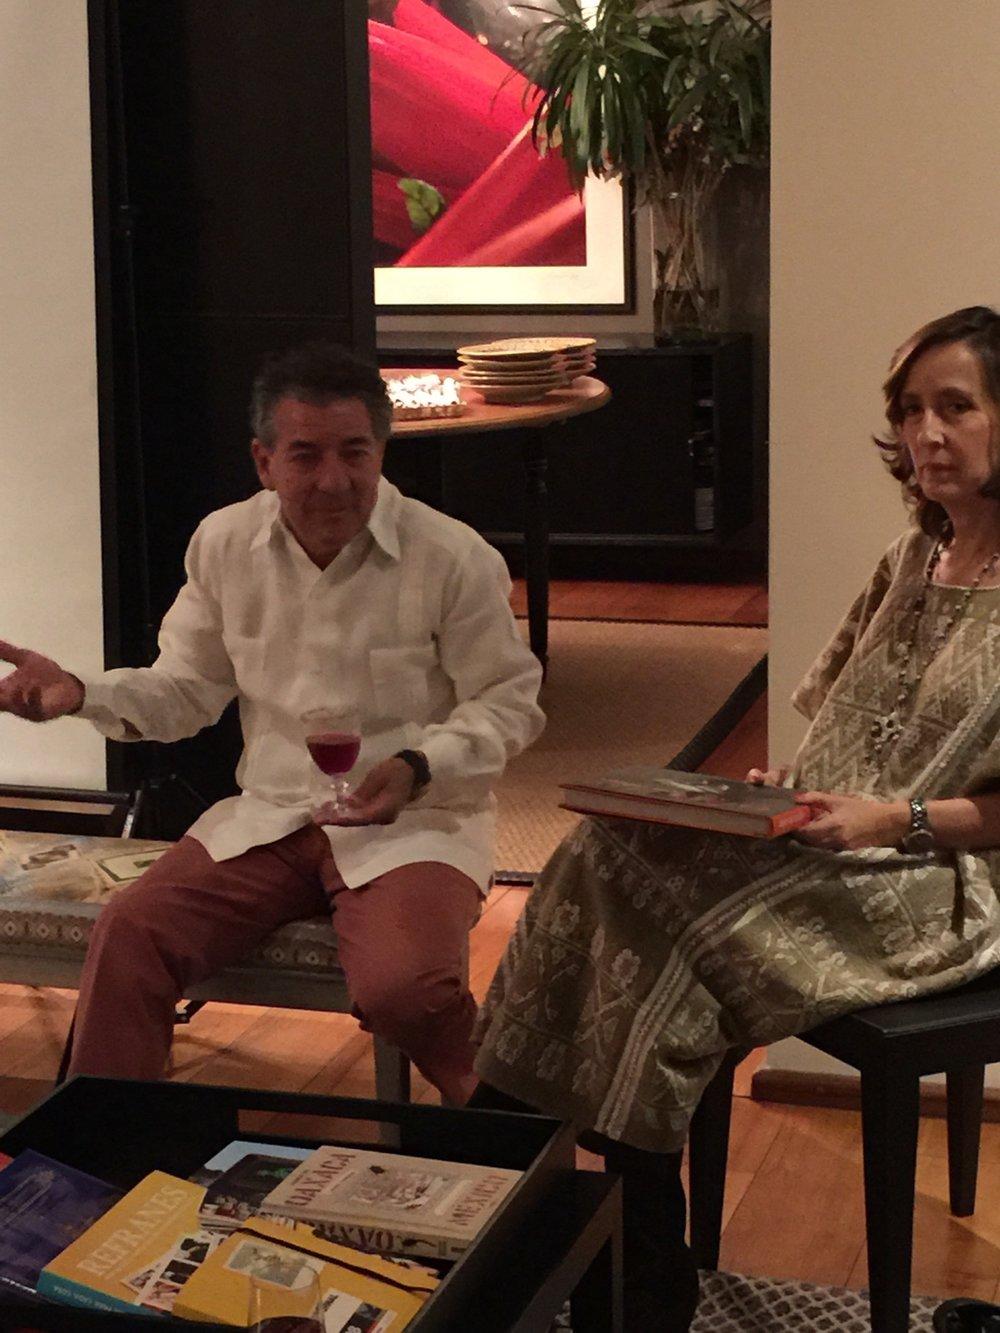 Nacho Urquiza and Laura Cordera